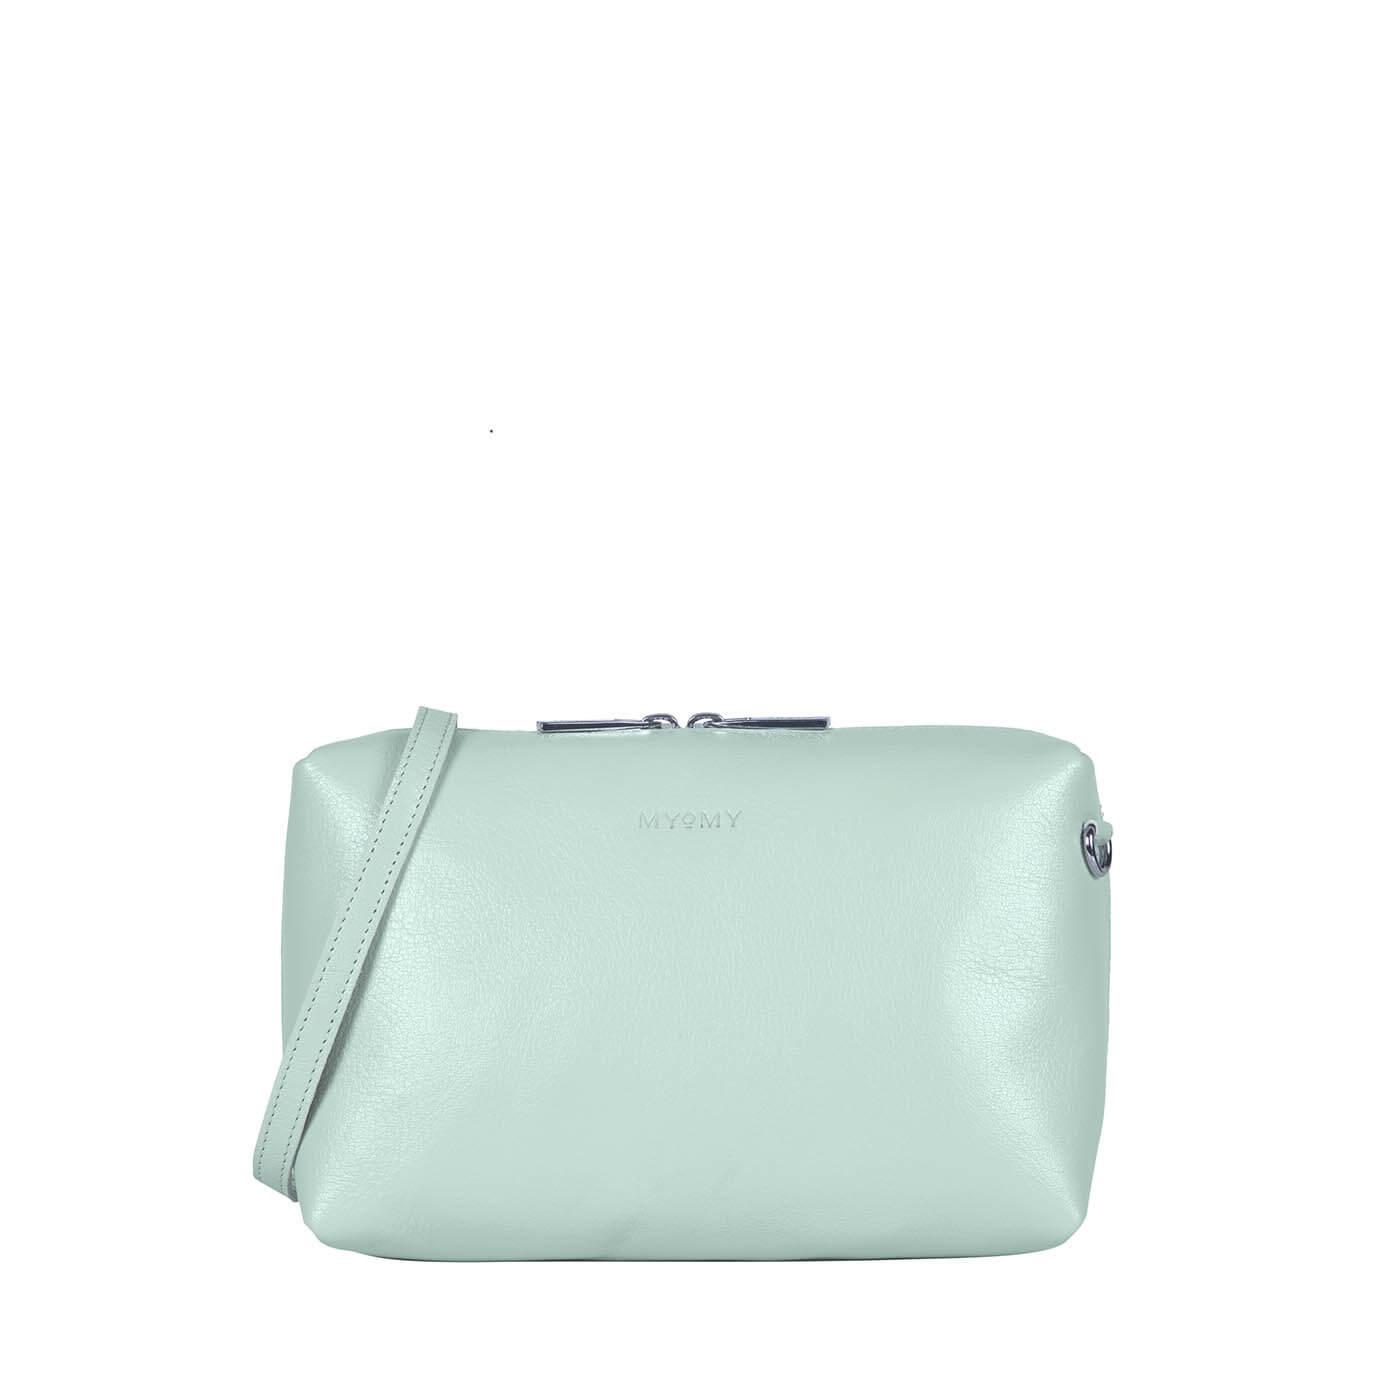 MY BOXY BAG Handbag - seville mint